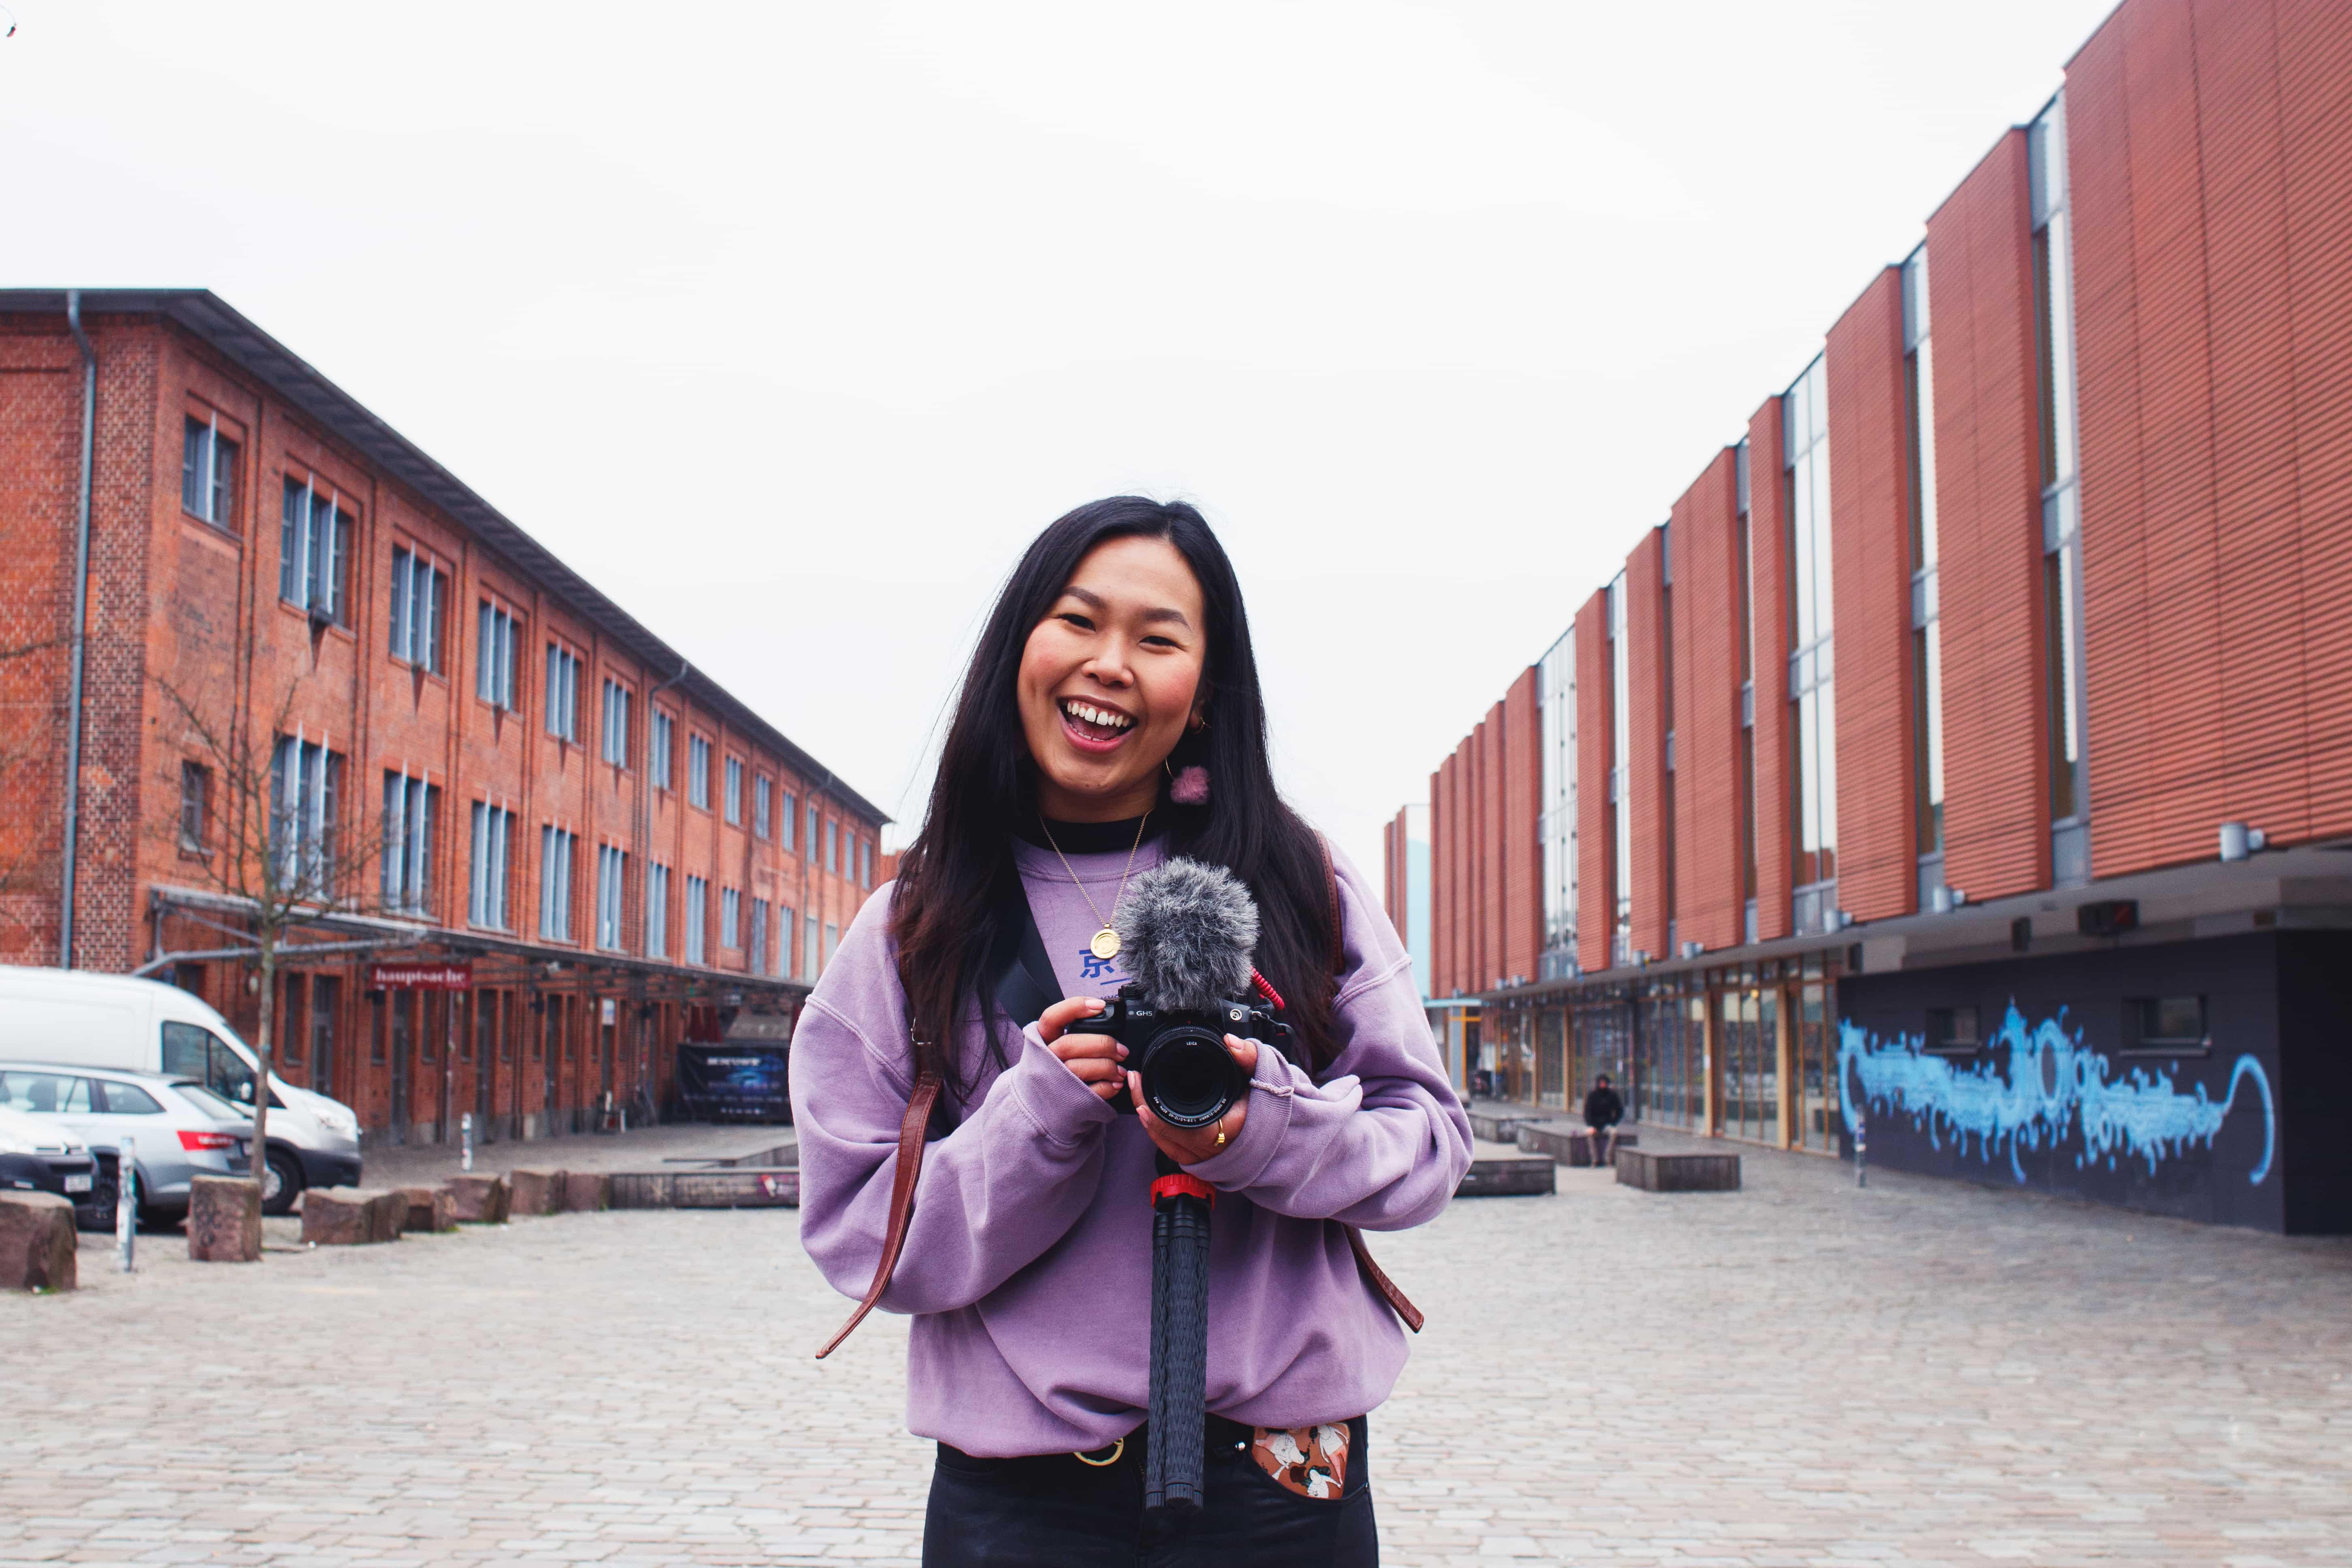 Shu with a camera